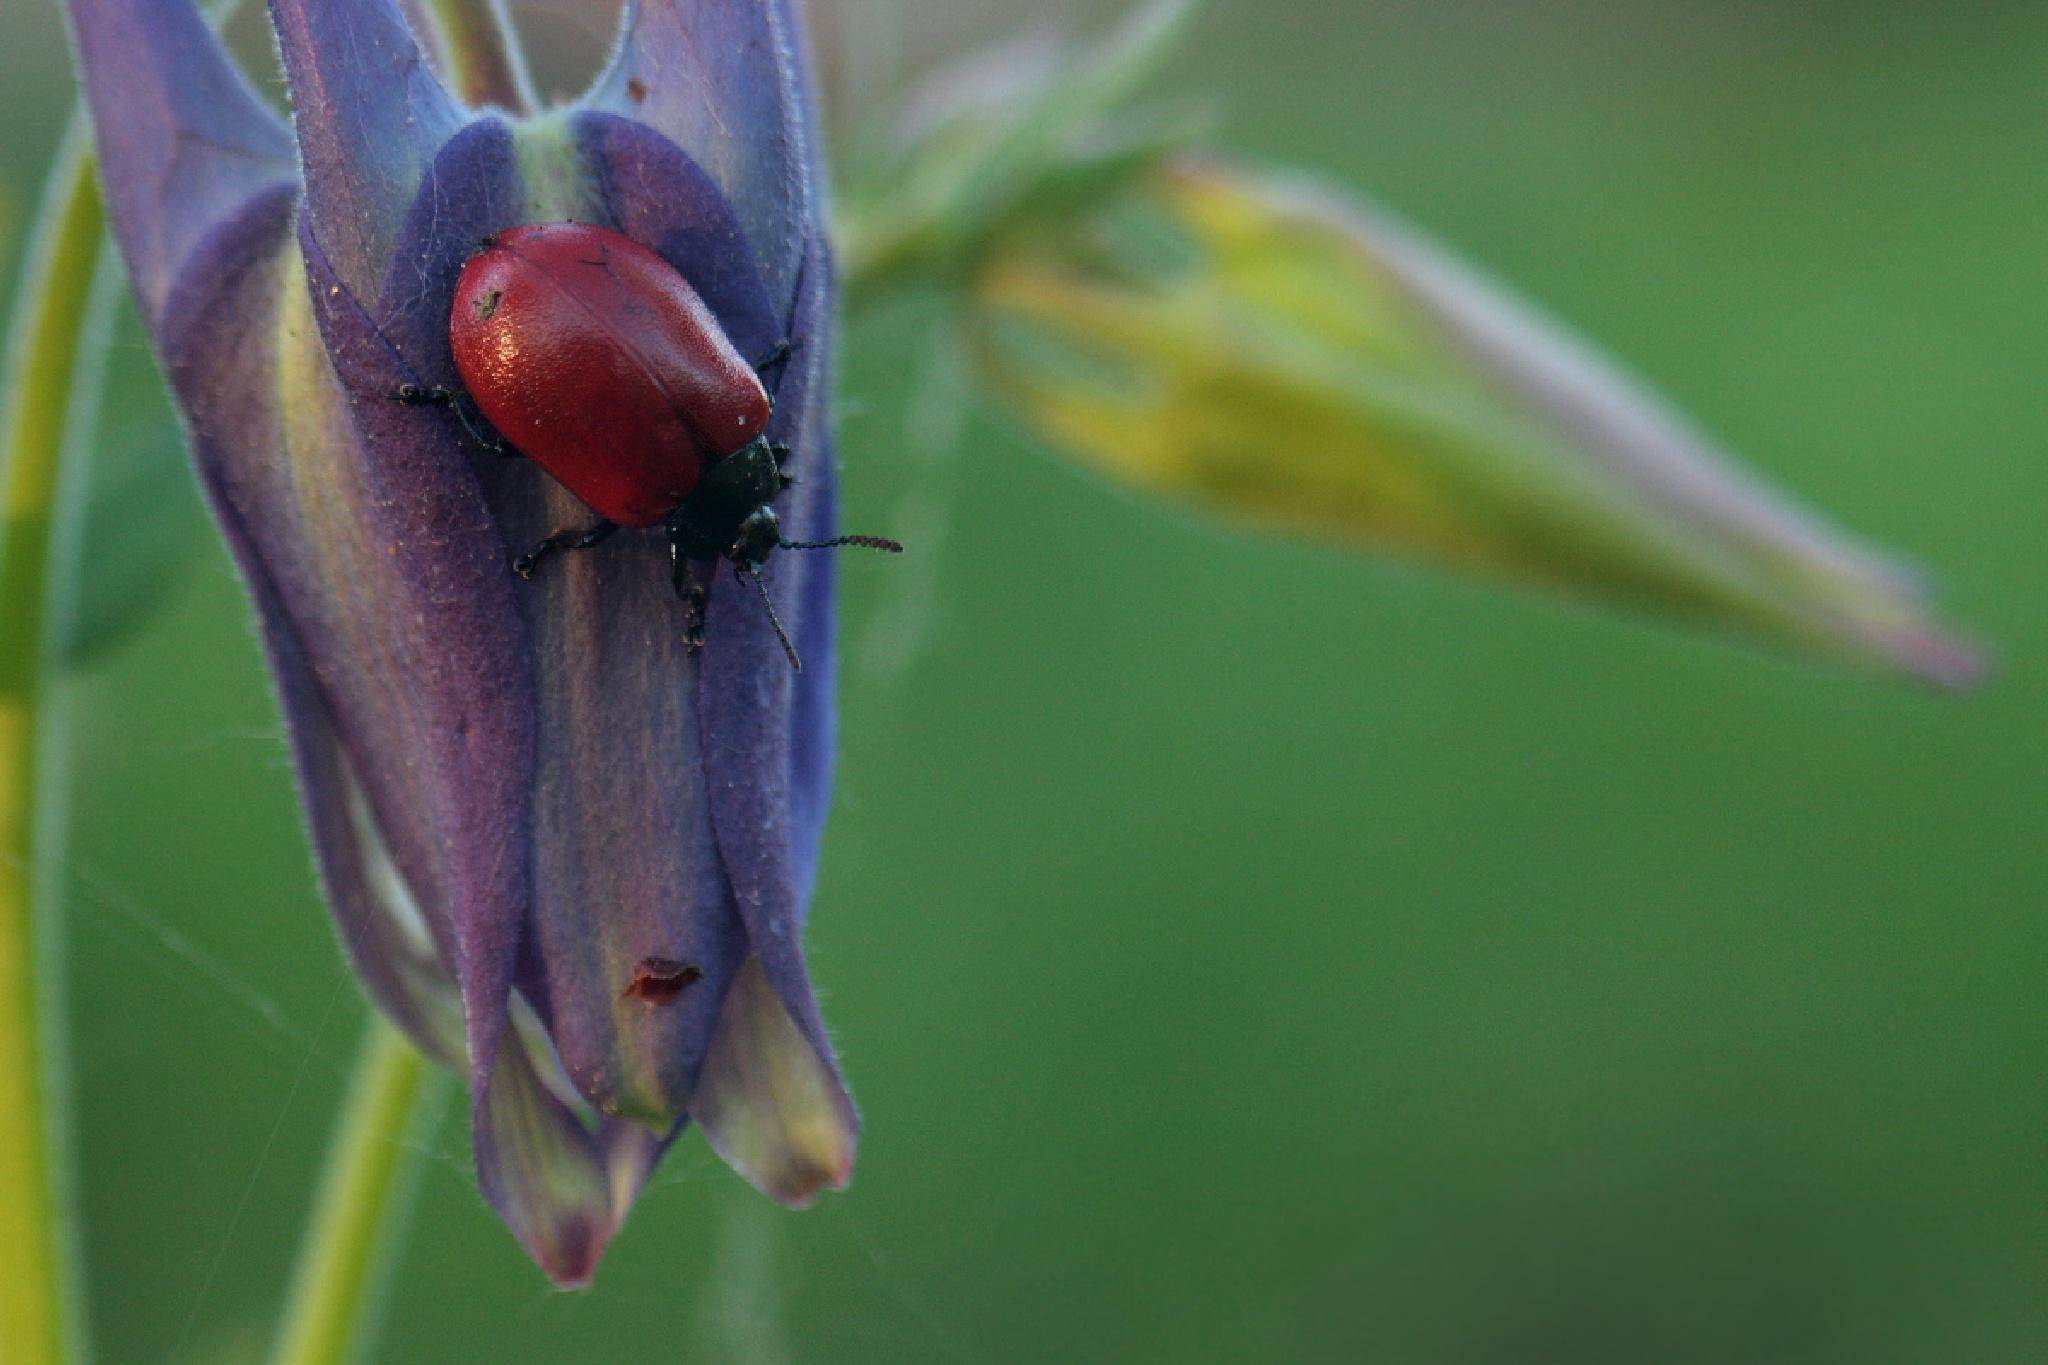 red beetle by Alexey Komarov